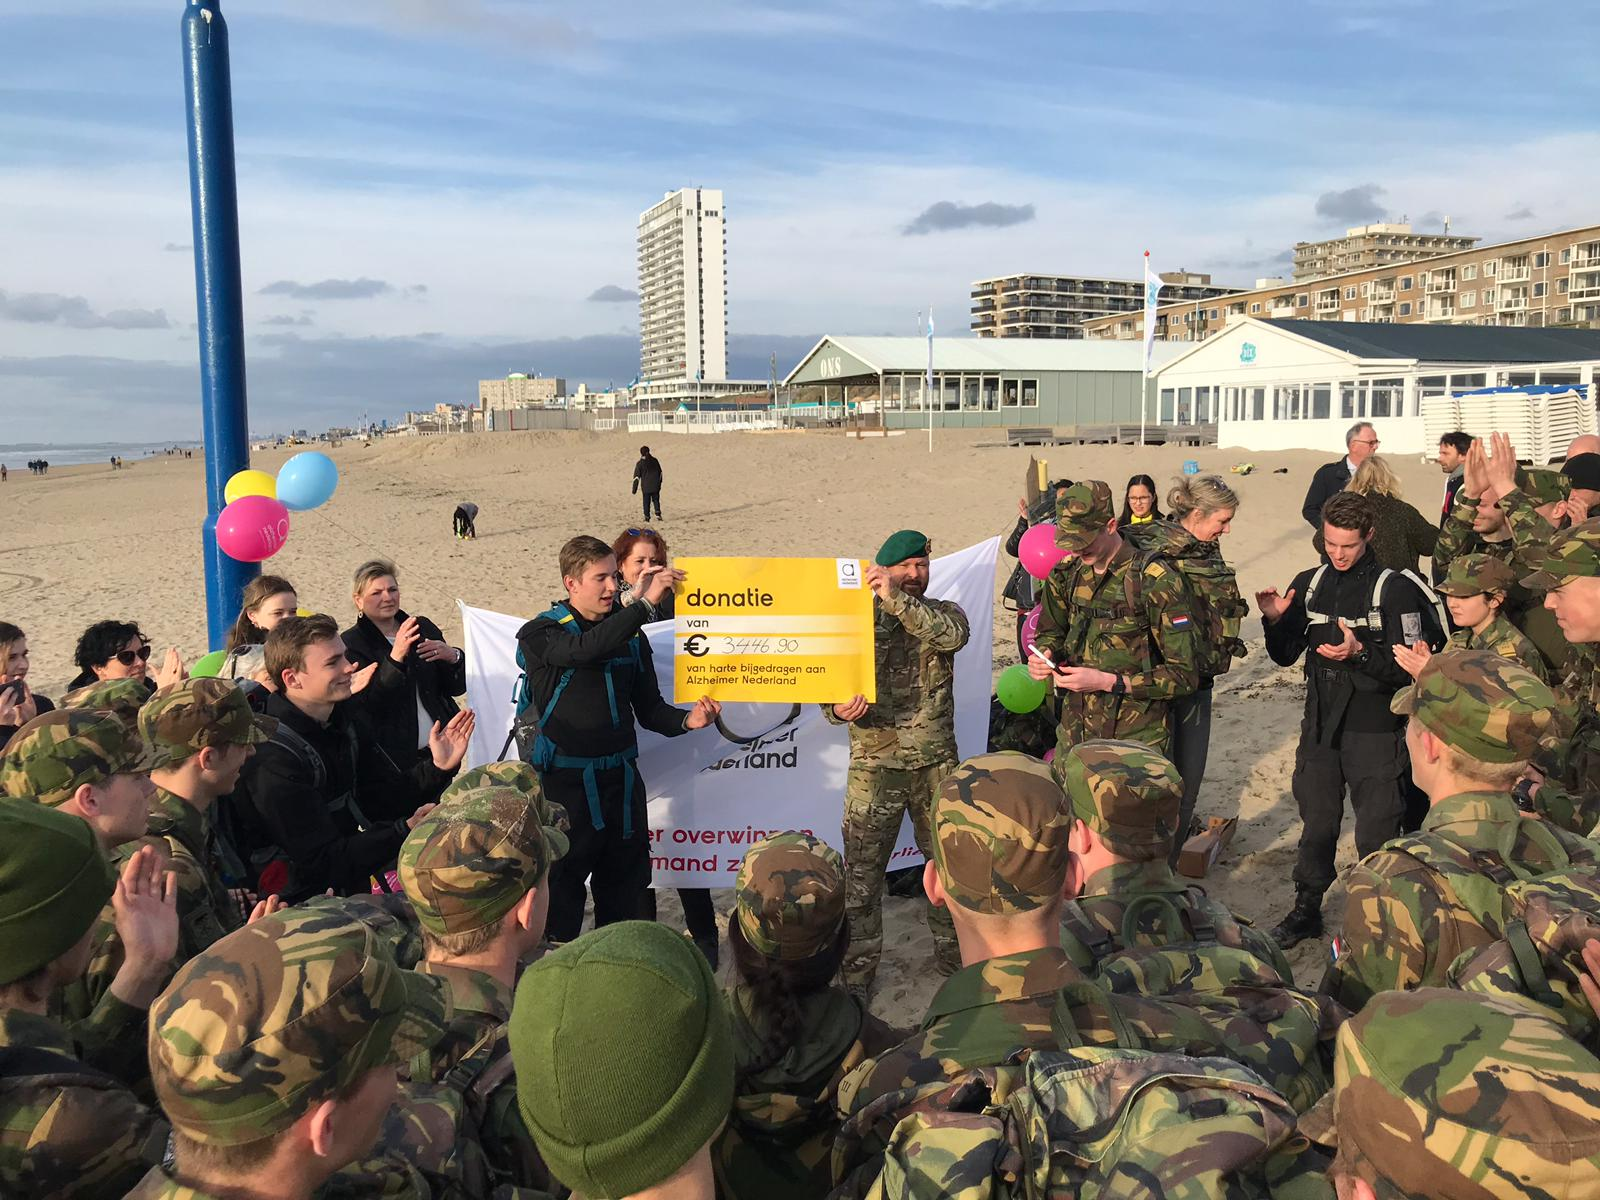 2019-04-05 | Marco Kroon spreekt VeVa leerlingen na goed doel mars toe